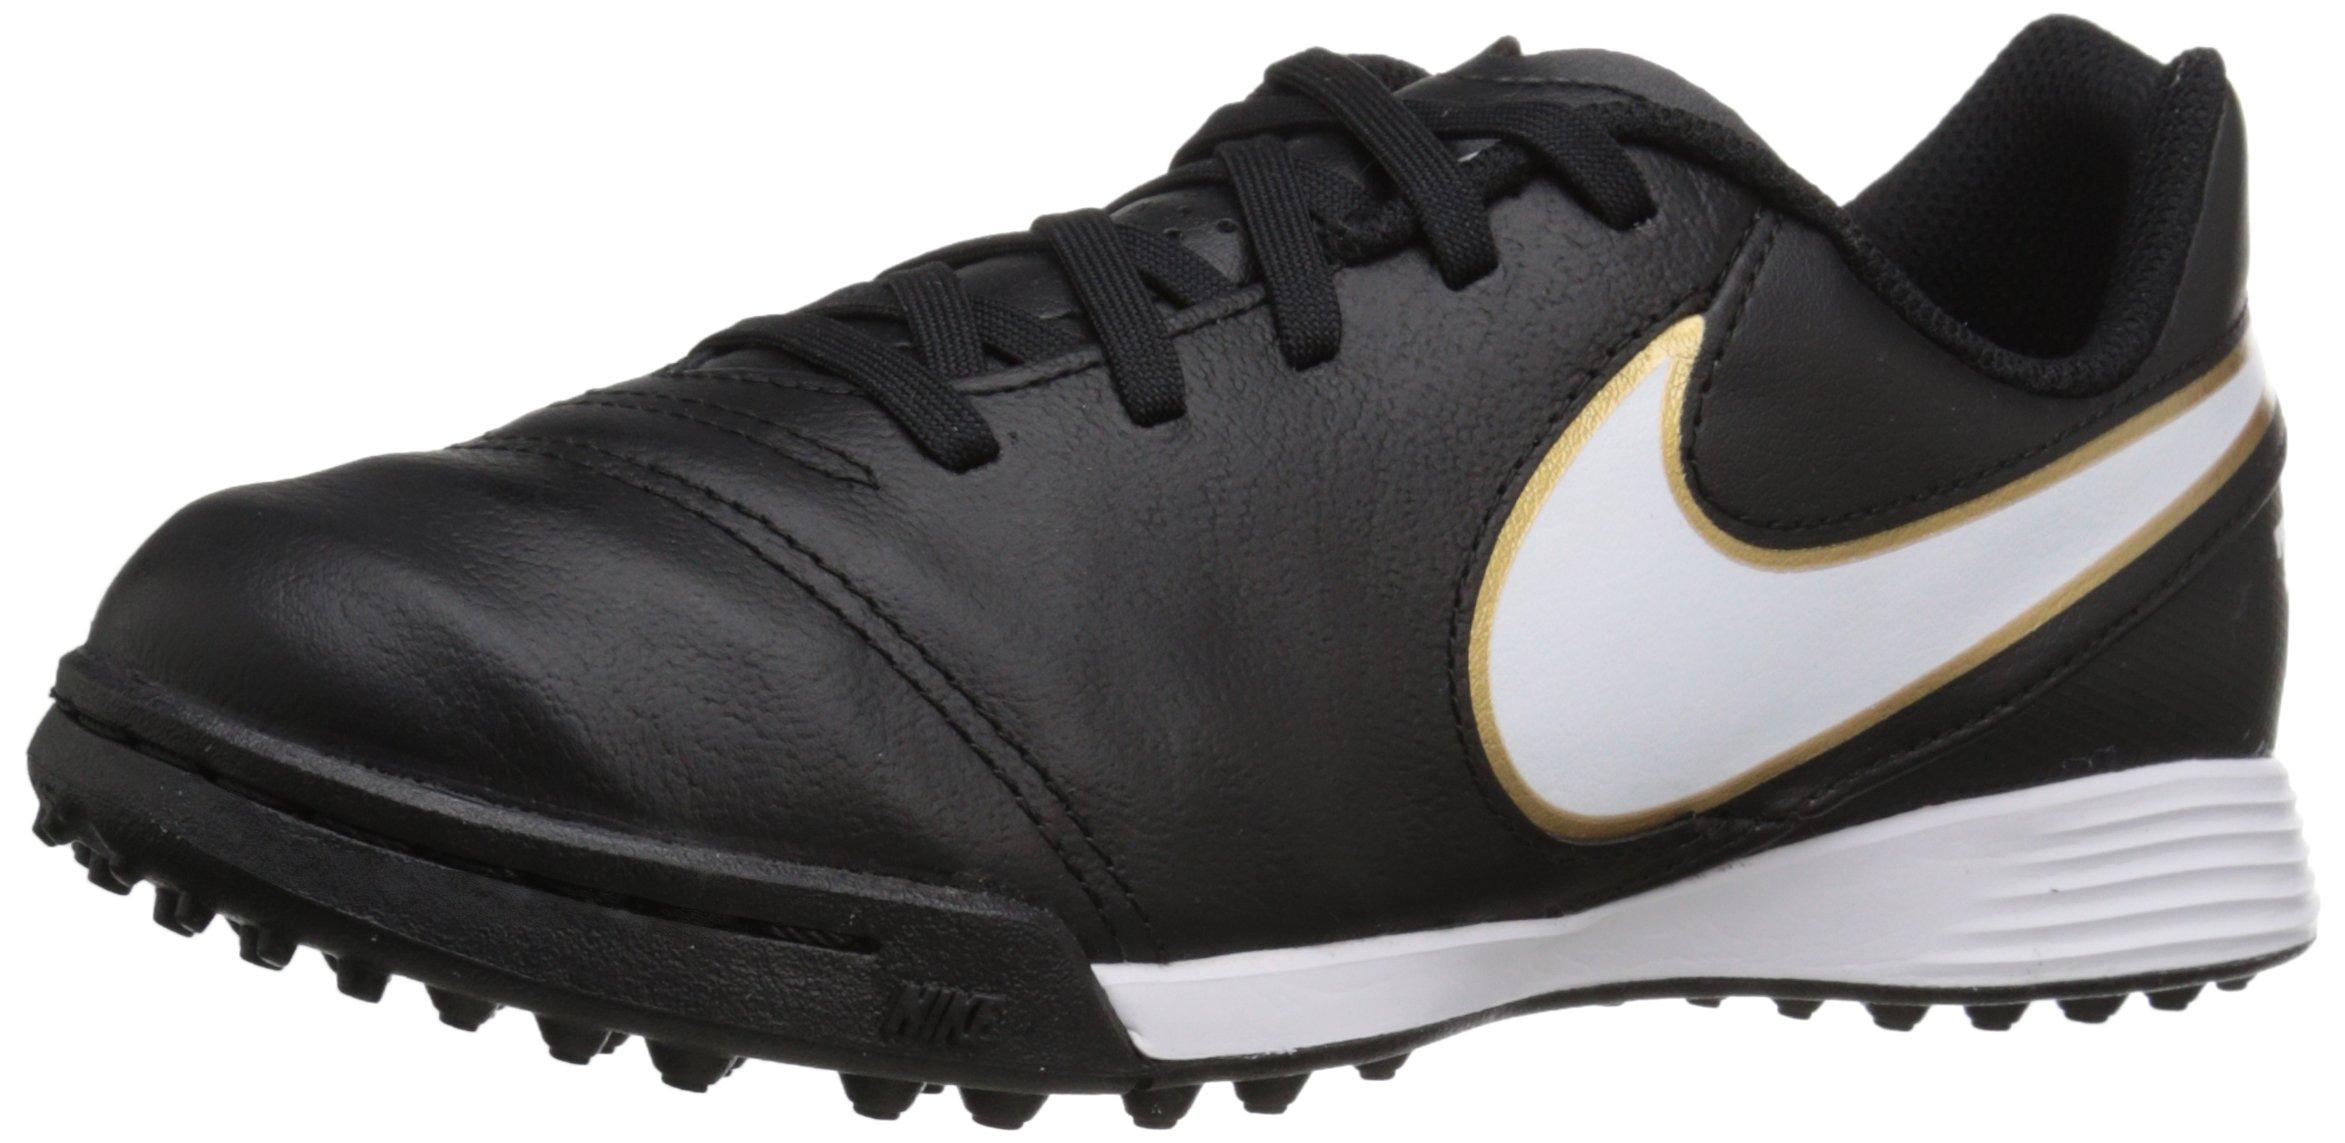 uk availability e6ef4 0464a Nike Shox NZ Womens Running Shoes [314561-011] Black/Black-Chlorine Blue  Womens Shoes 314561-011-9.5